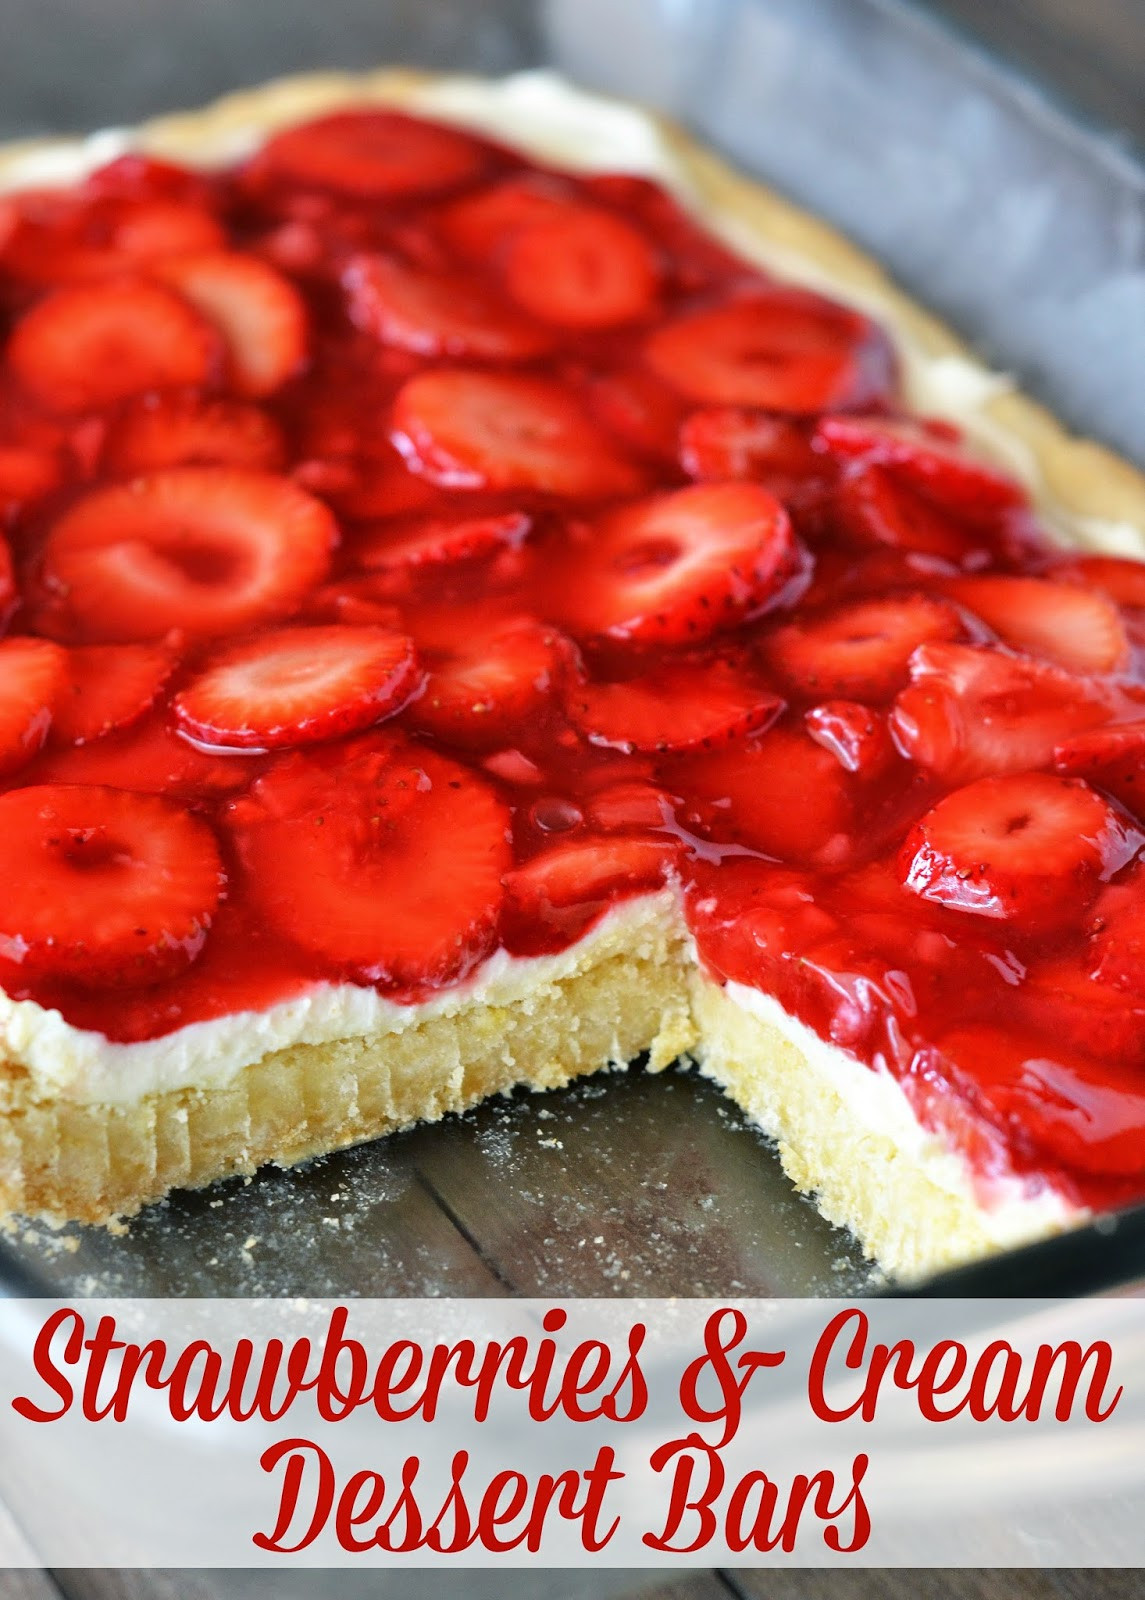 Strawberry Cream Cheese Desserts  The Country Cook Strawberries & Cream Dessert Bars